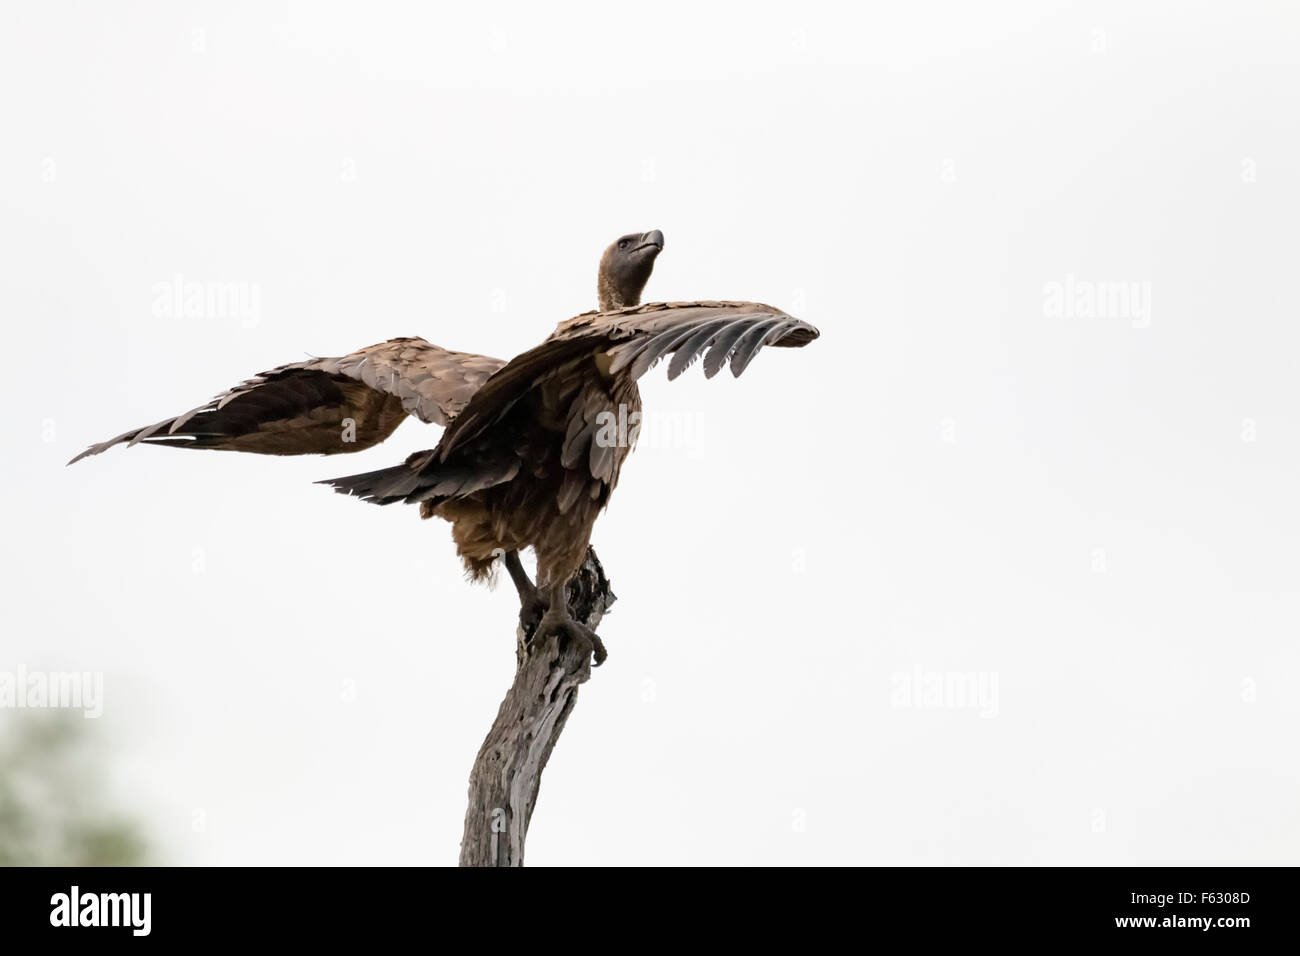 Basking Vulture - Stock Image